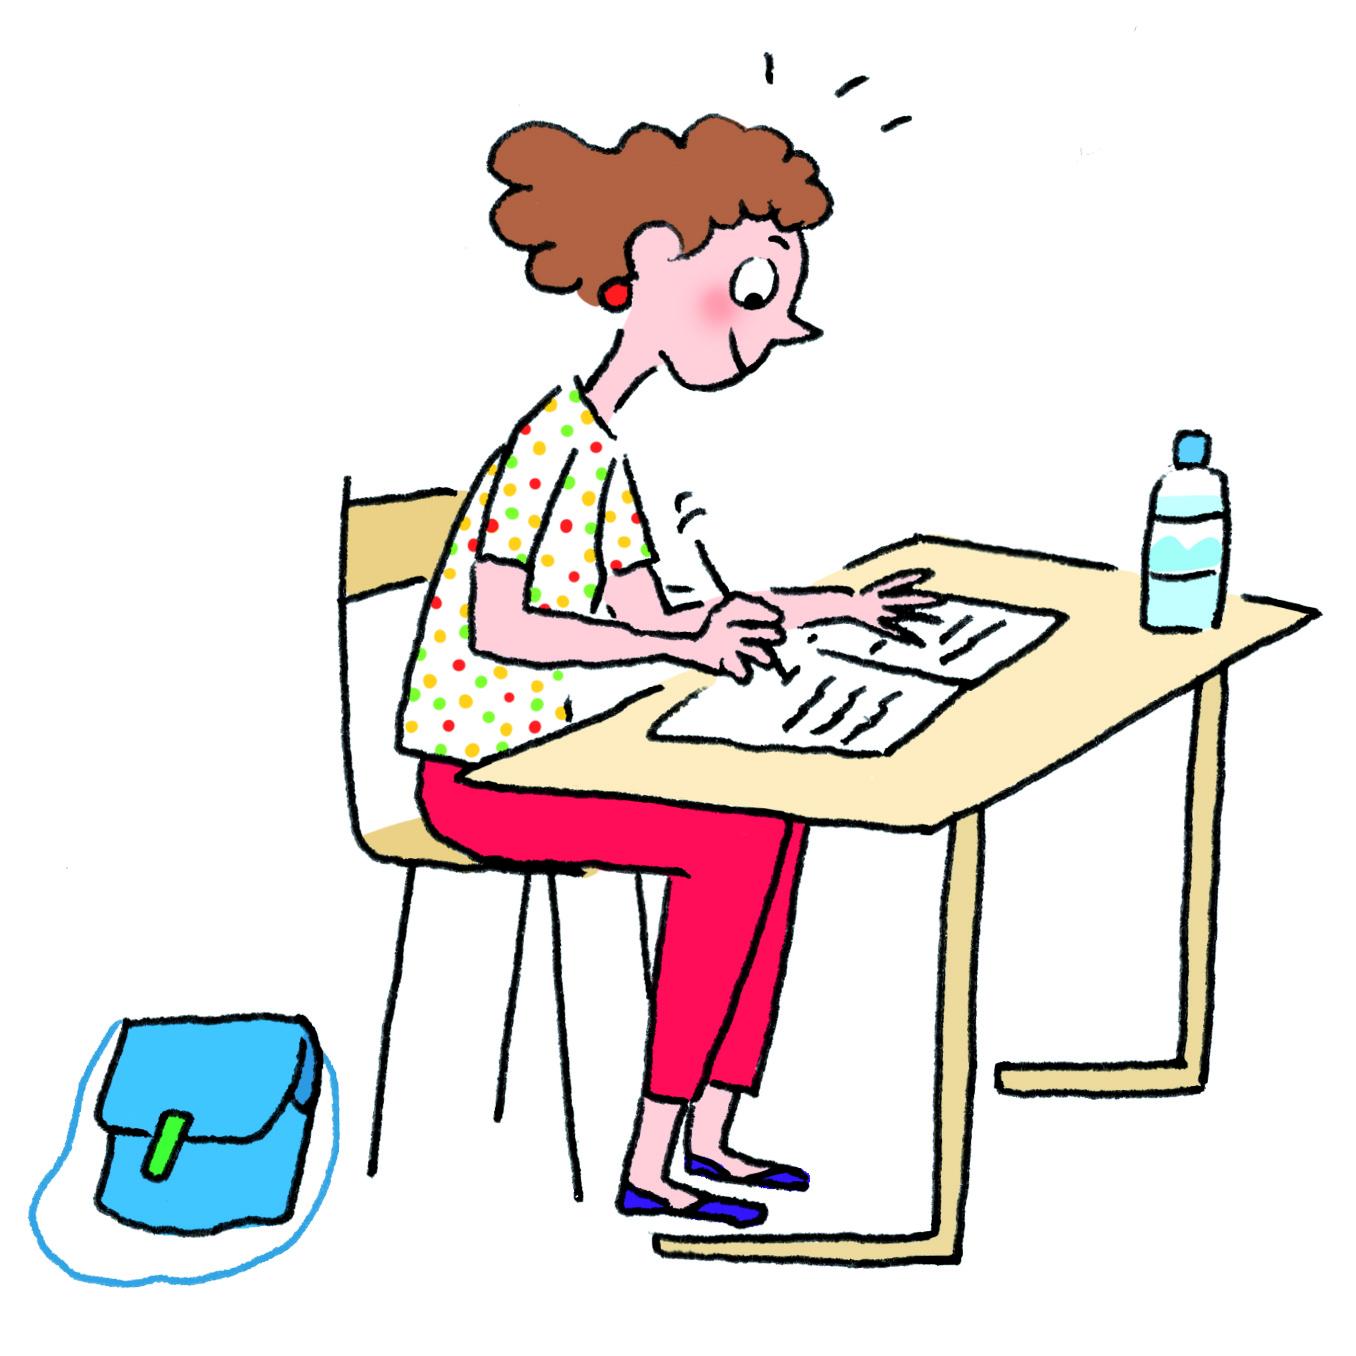 une jeune fille assise passant son brevet